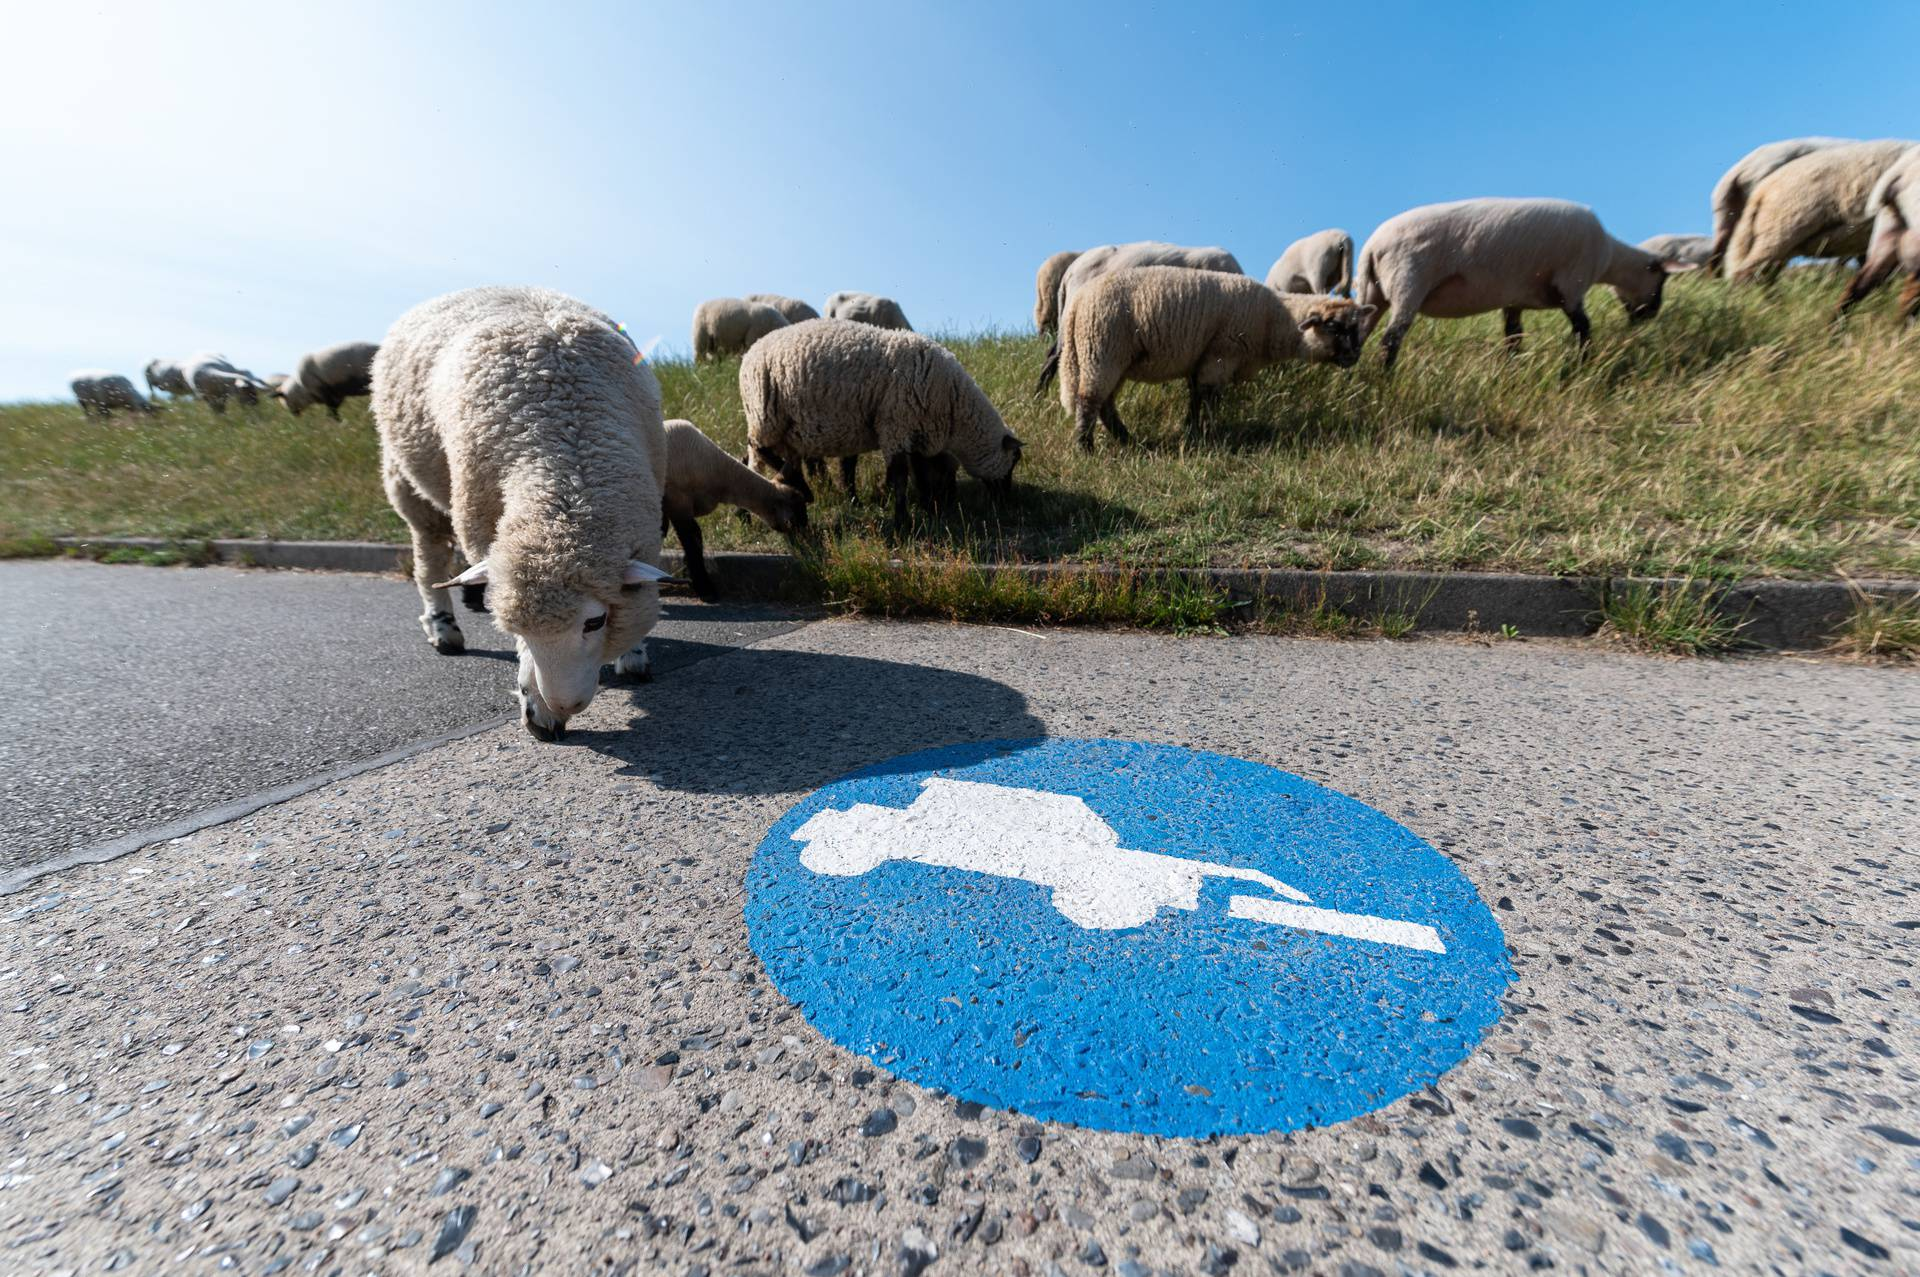 Piktogrami 'ovce na putu'